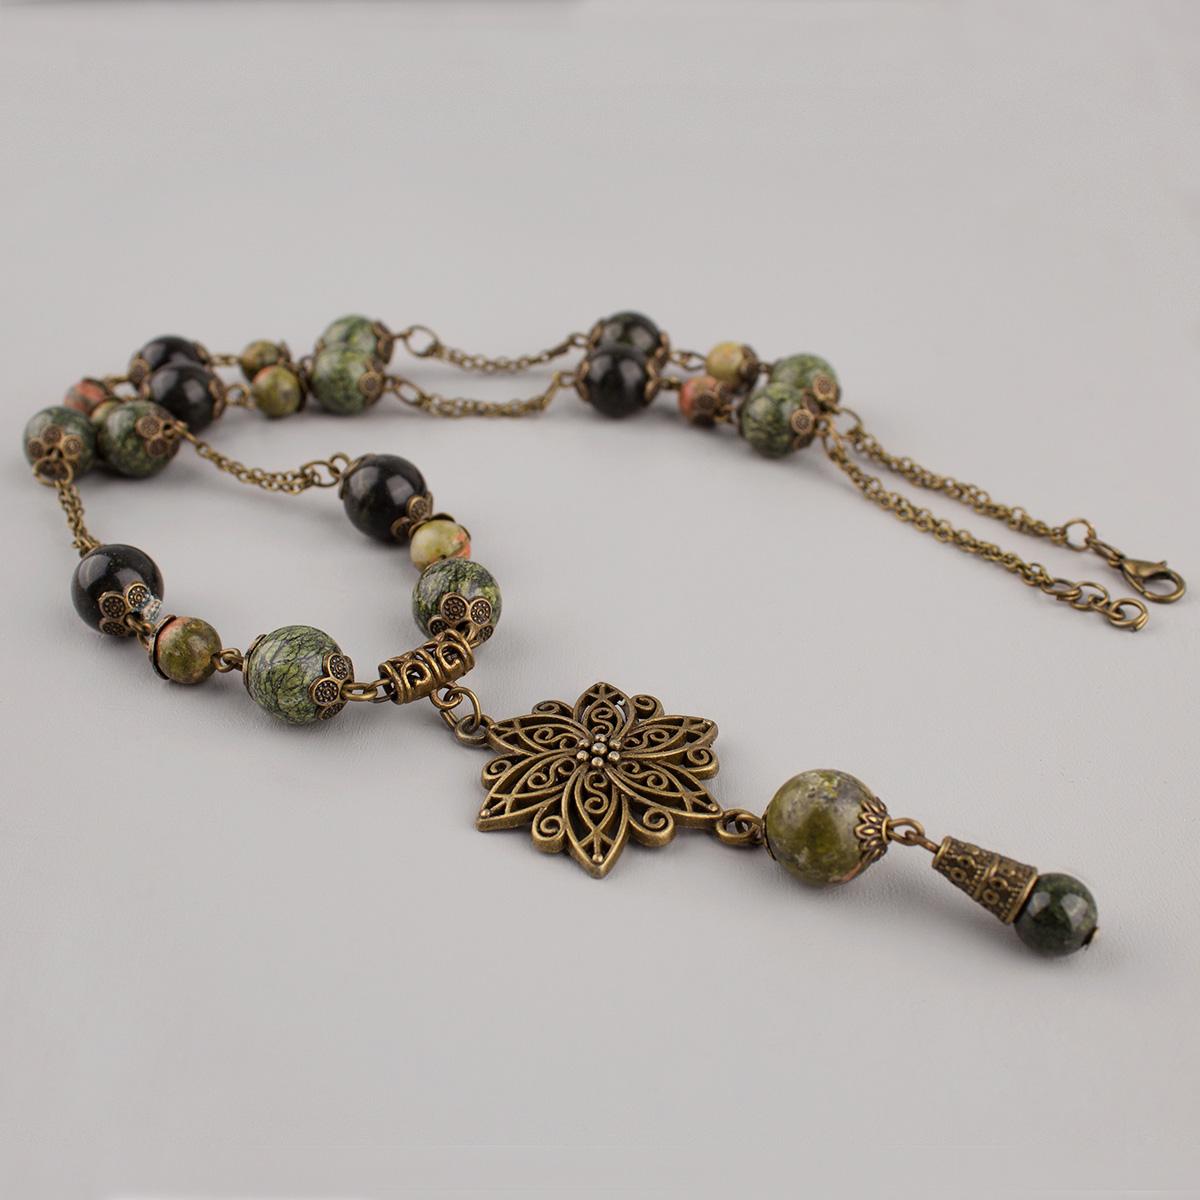 "Necklace ""Life stone"", Jasper and Serpentine"